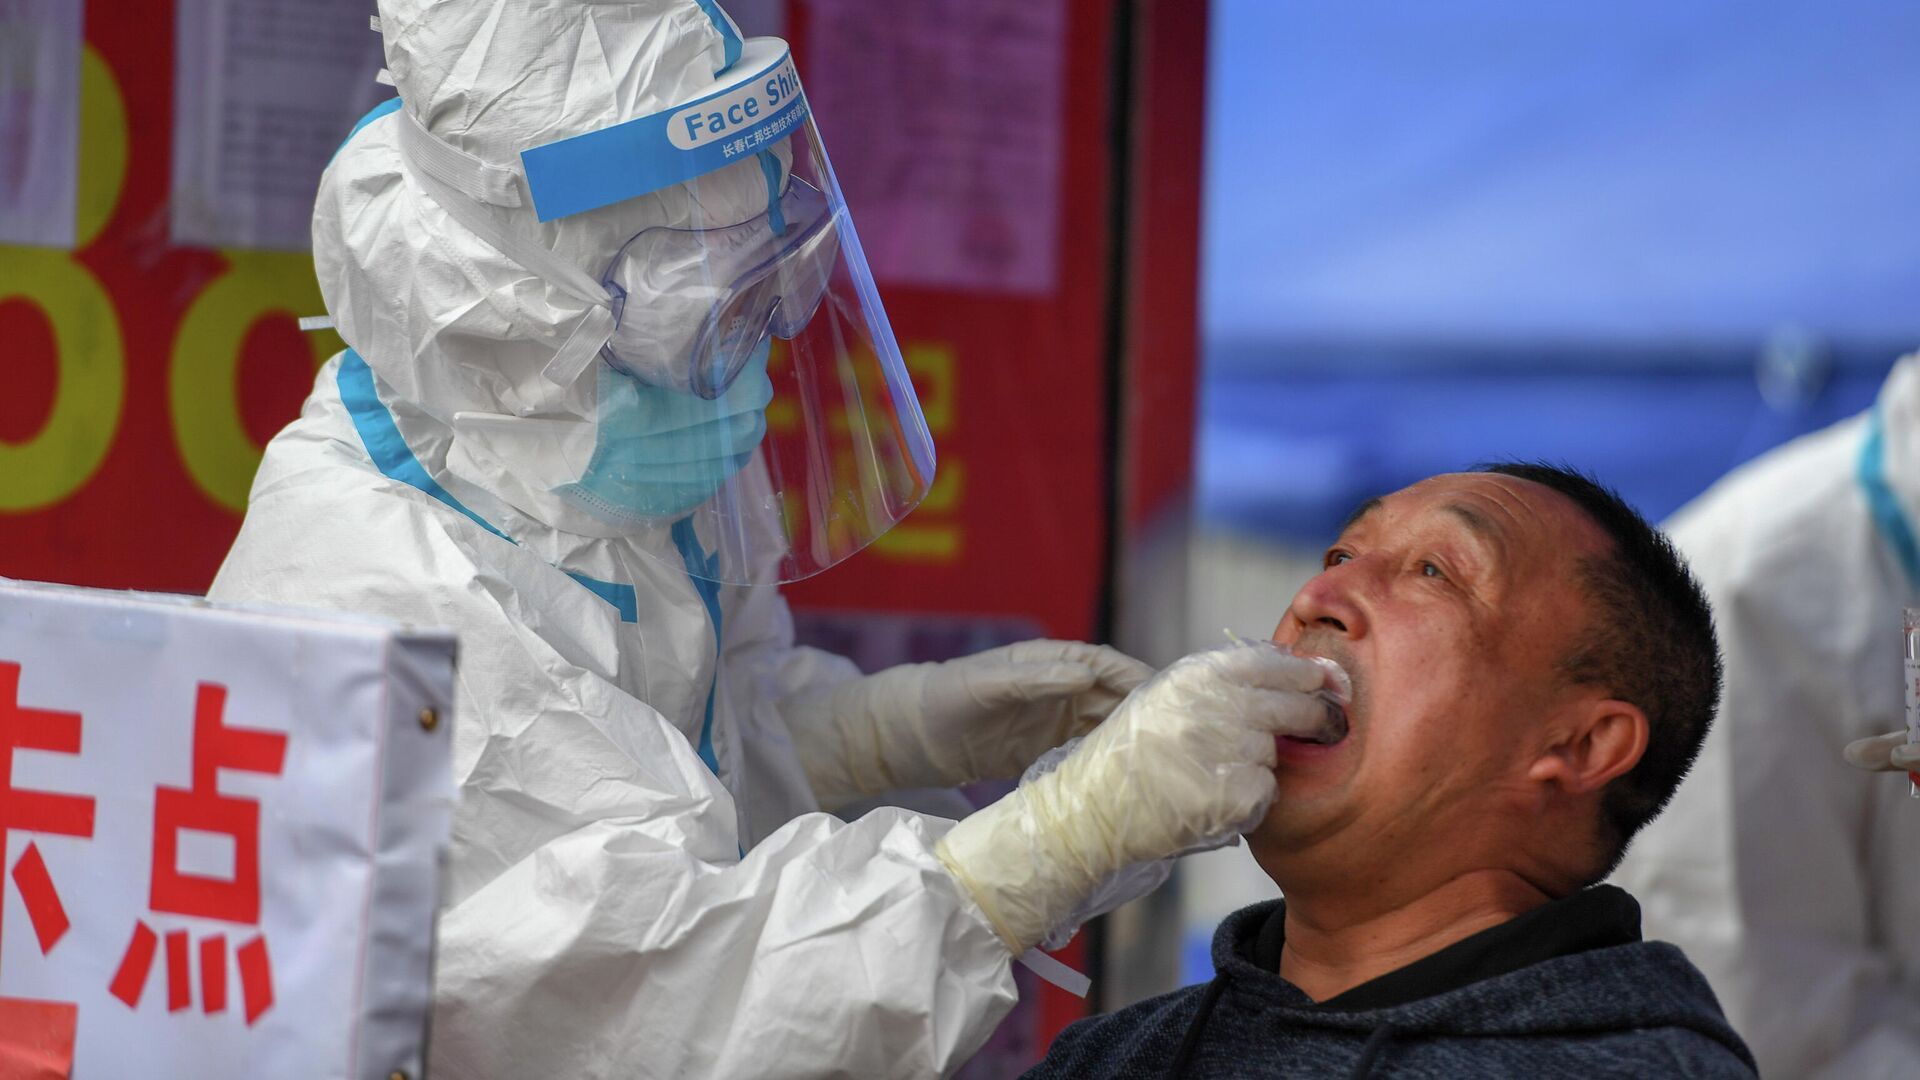 Медицинский работник делает тест на COVID-19 мужчине в провинции Цзилинь, Китай - РИА Новости, 1920, 26.11.2020